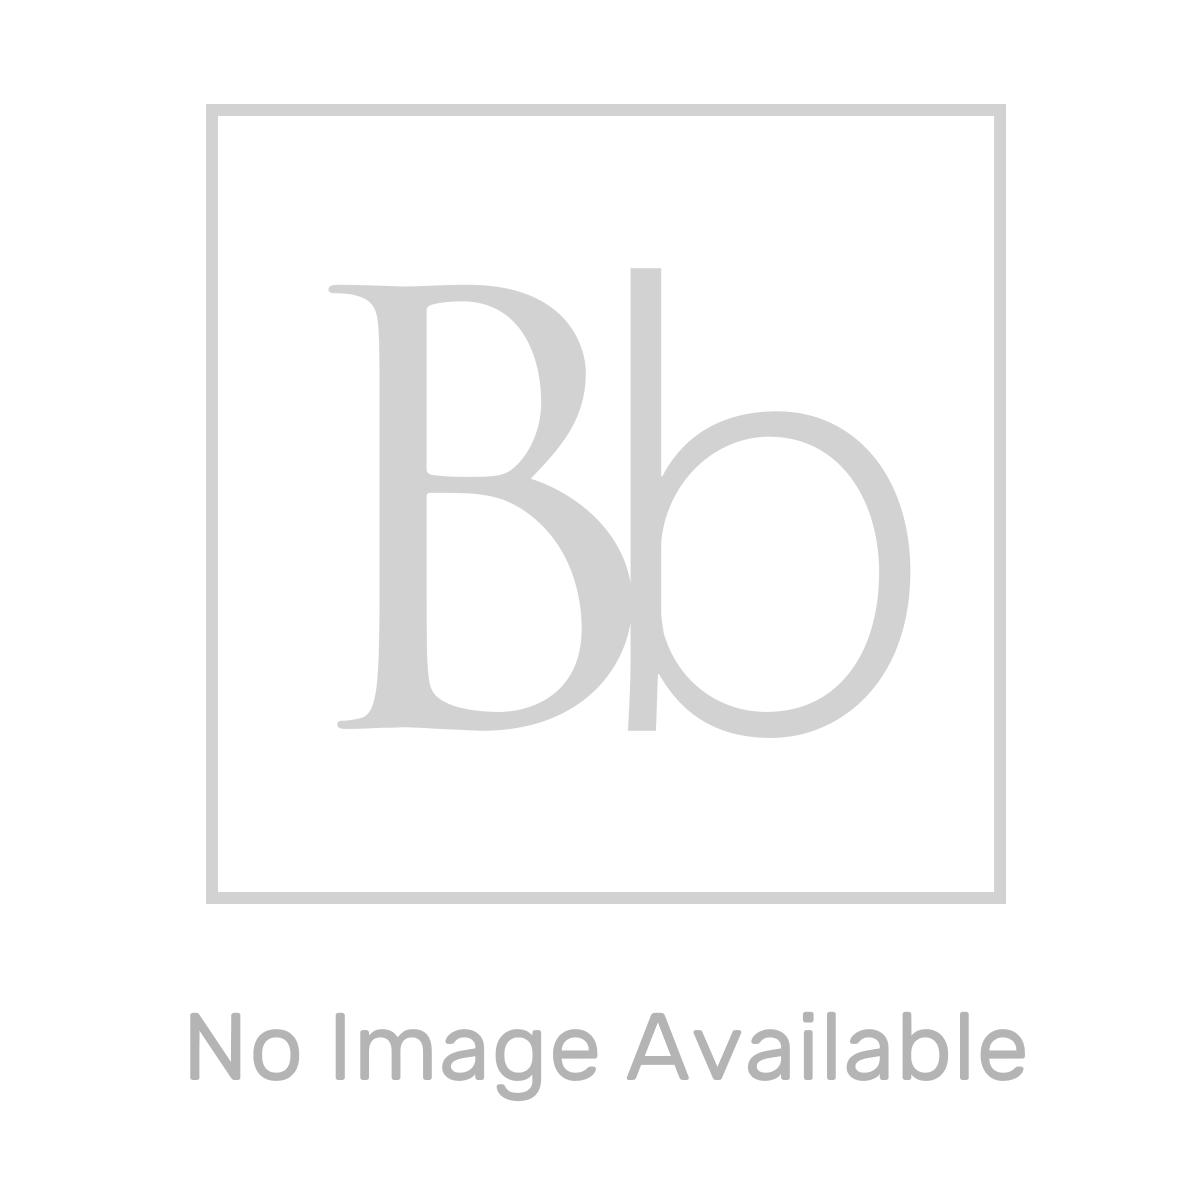 RAK Gloss Black Chrome Round Mixer Shower Measurements